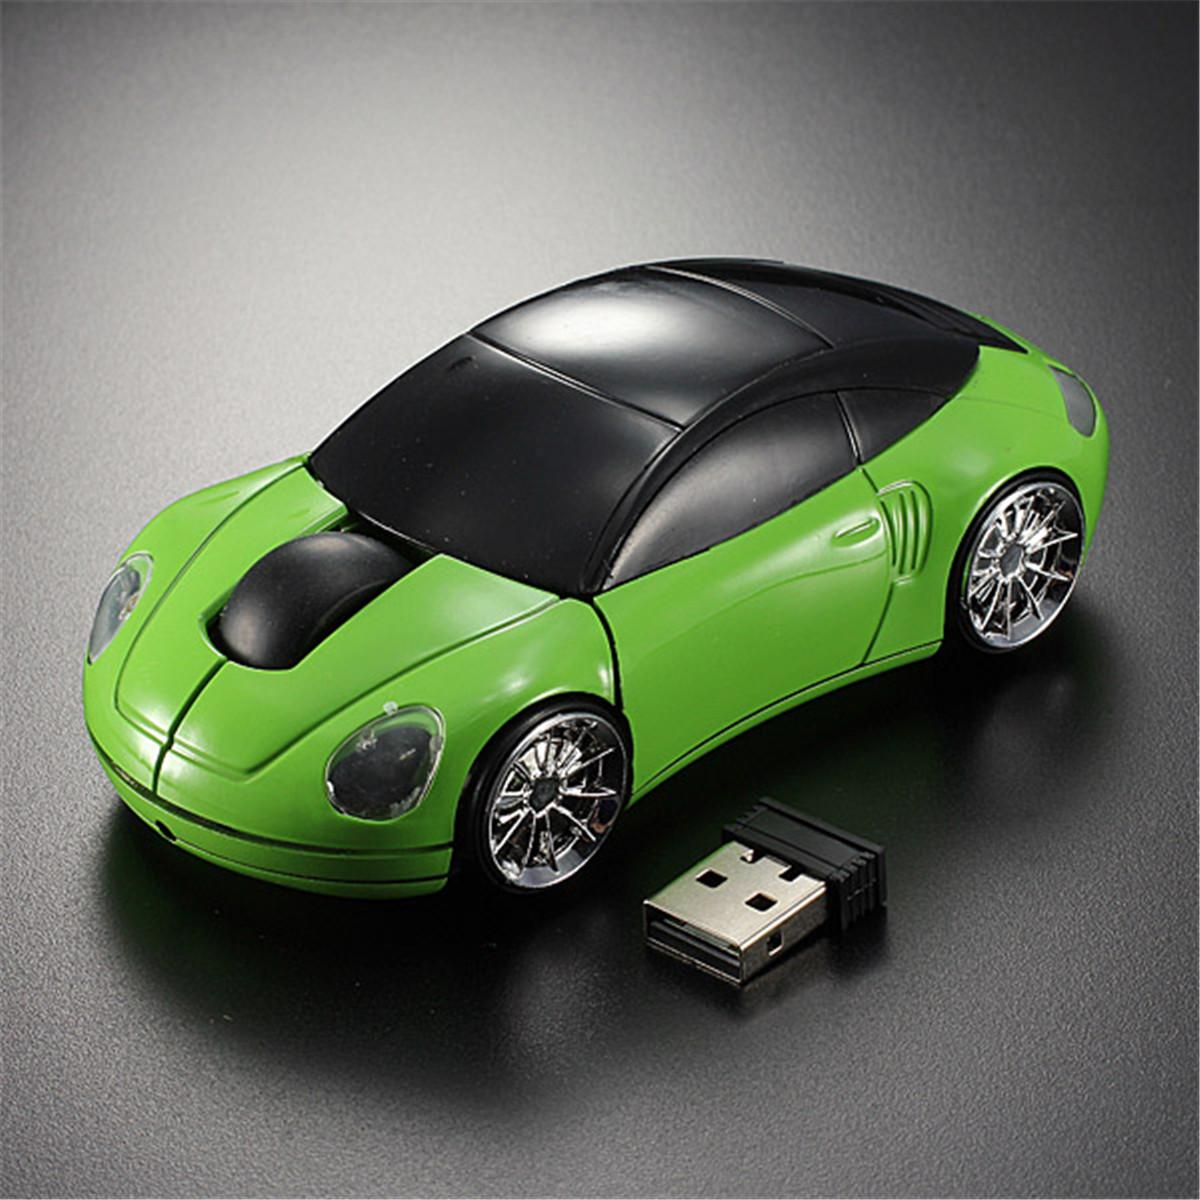 USB Wireless Optical Mouse 2.4GHz 1600DPI 3D Car Shape Mice for Laptop PC